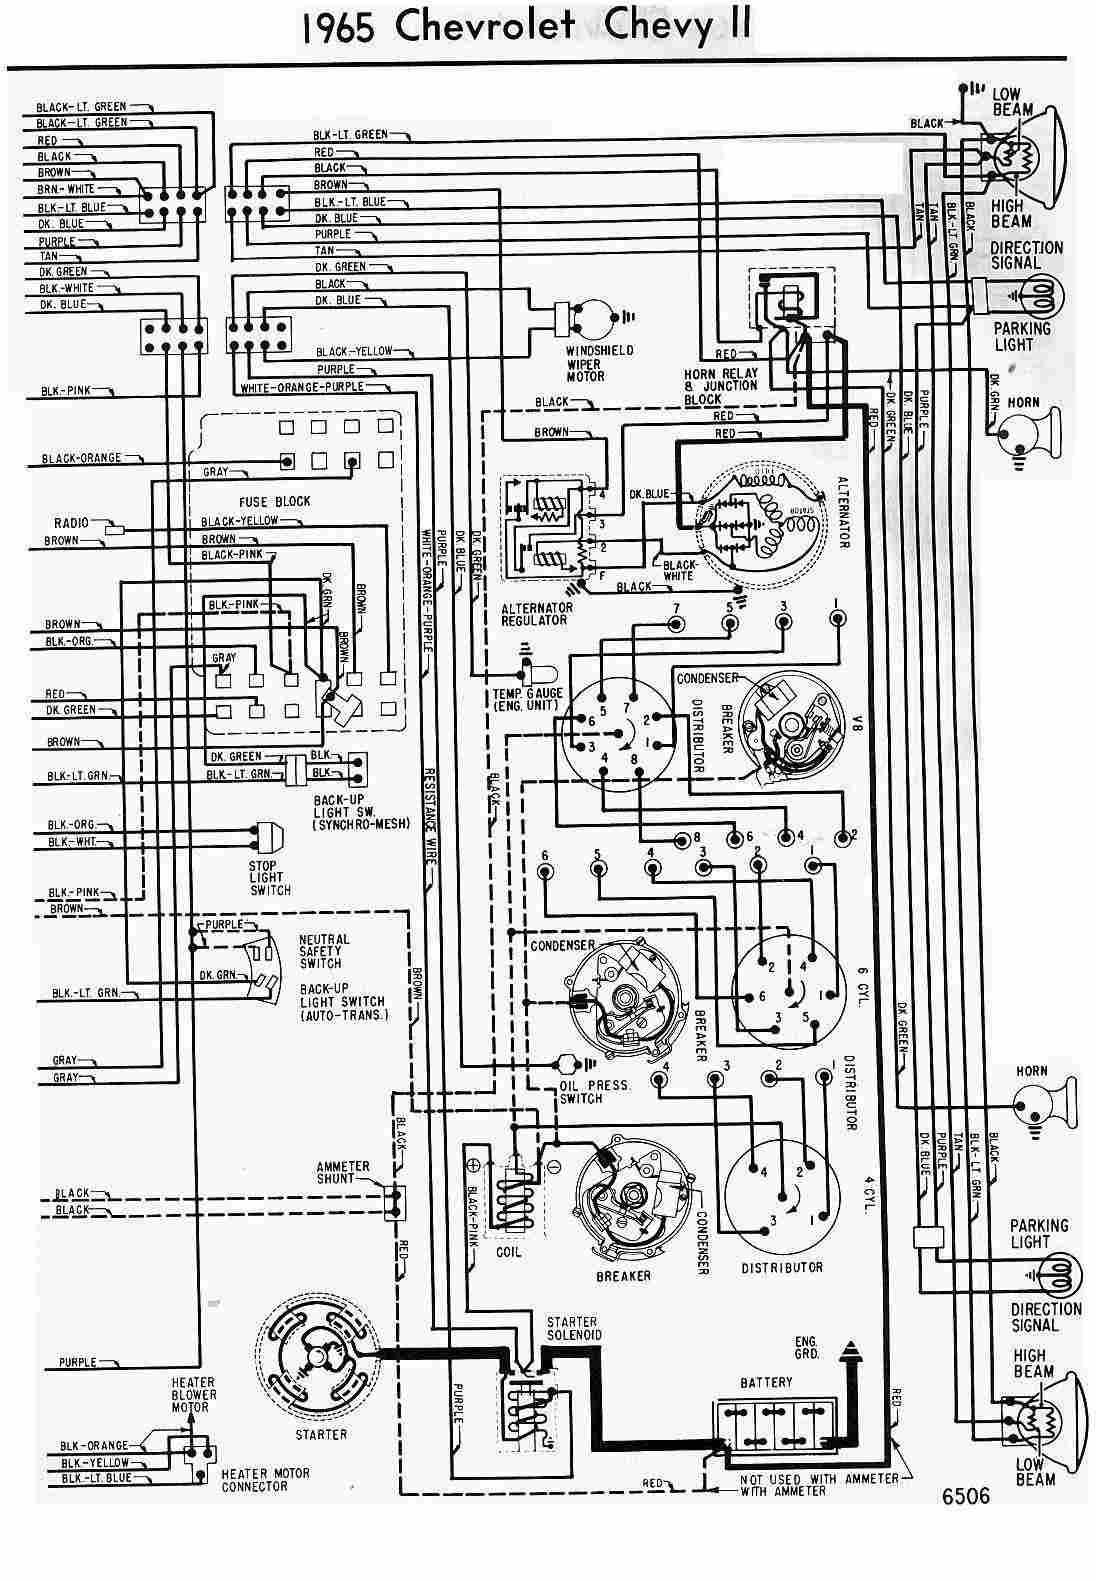 66 impala ss wiring diagram wiring diagrams66 impala ss wiring diagram wiring library 1964 impala tail [ 1096 x 1581 Pixel ]